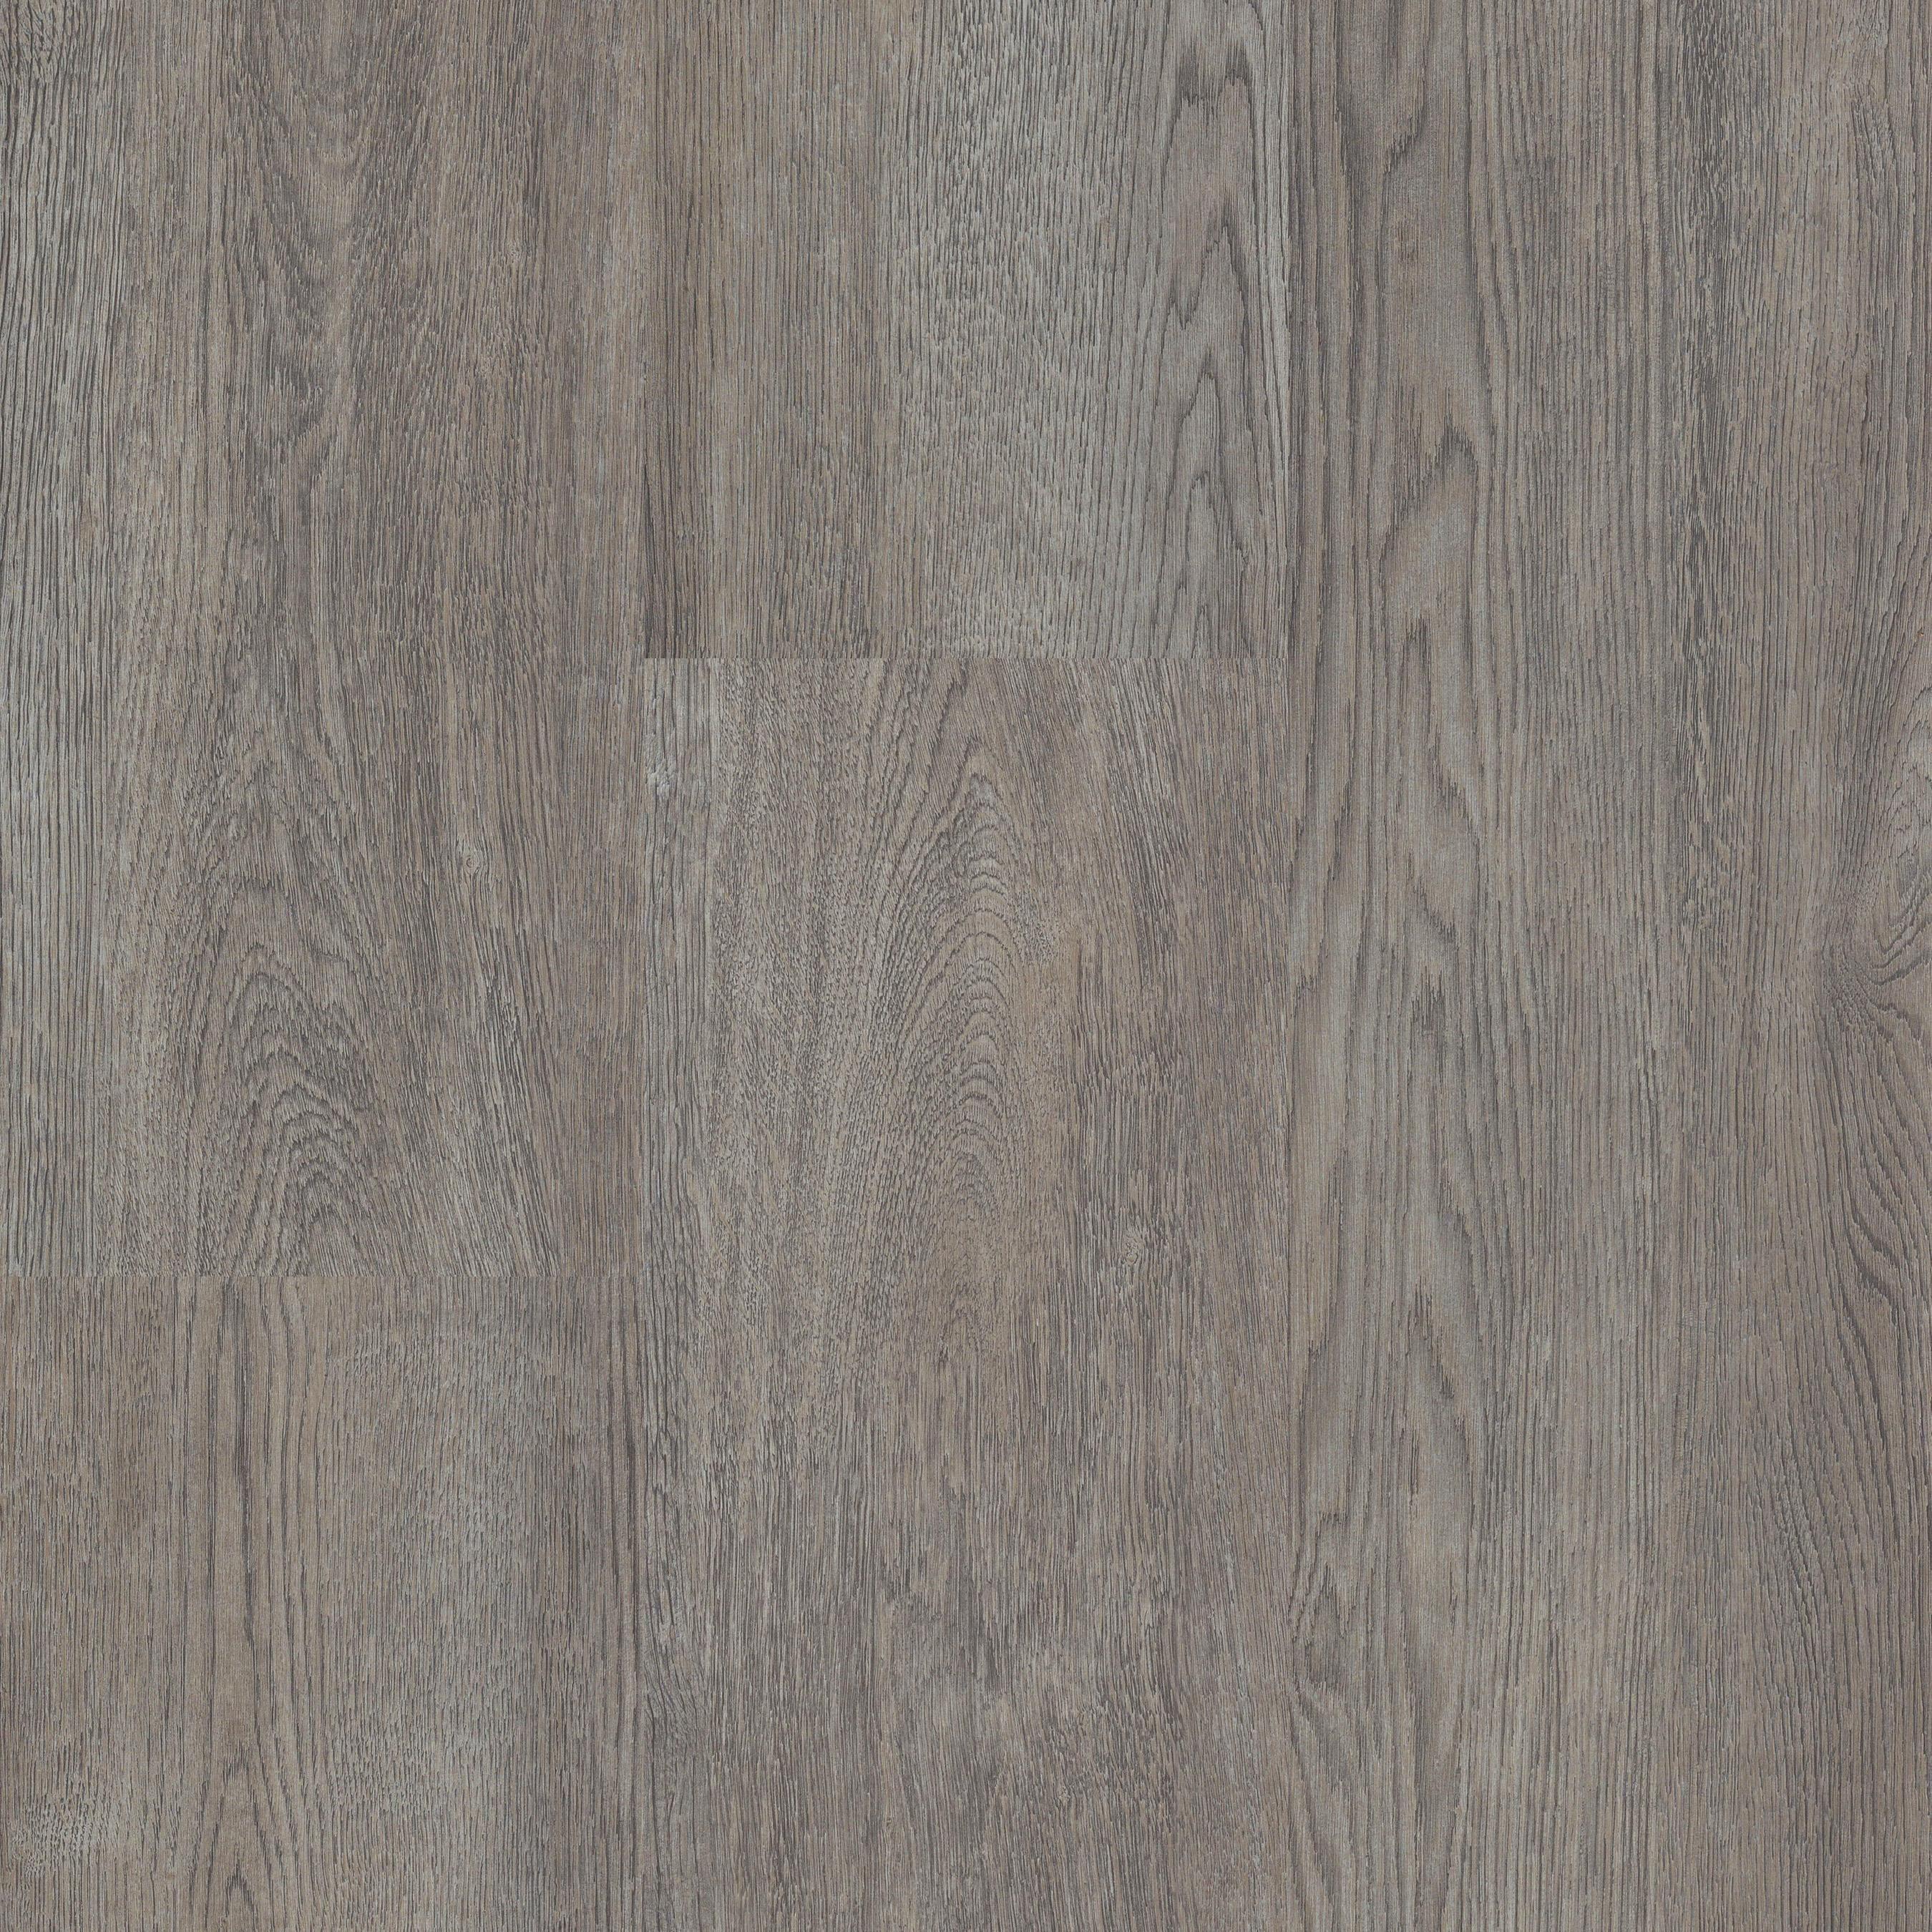 Mohawk Trigado Greige Oak Coretec Style Wpc Vinyl Flooring With Attached Cork Backing Vinyl Flooring Vinyl Plank Flooring Flooring